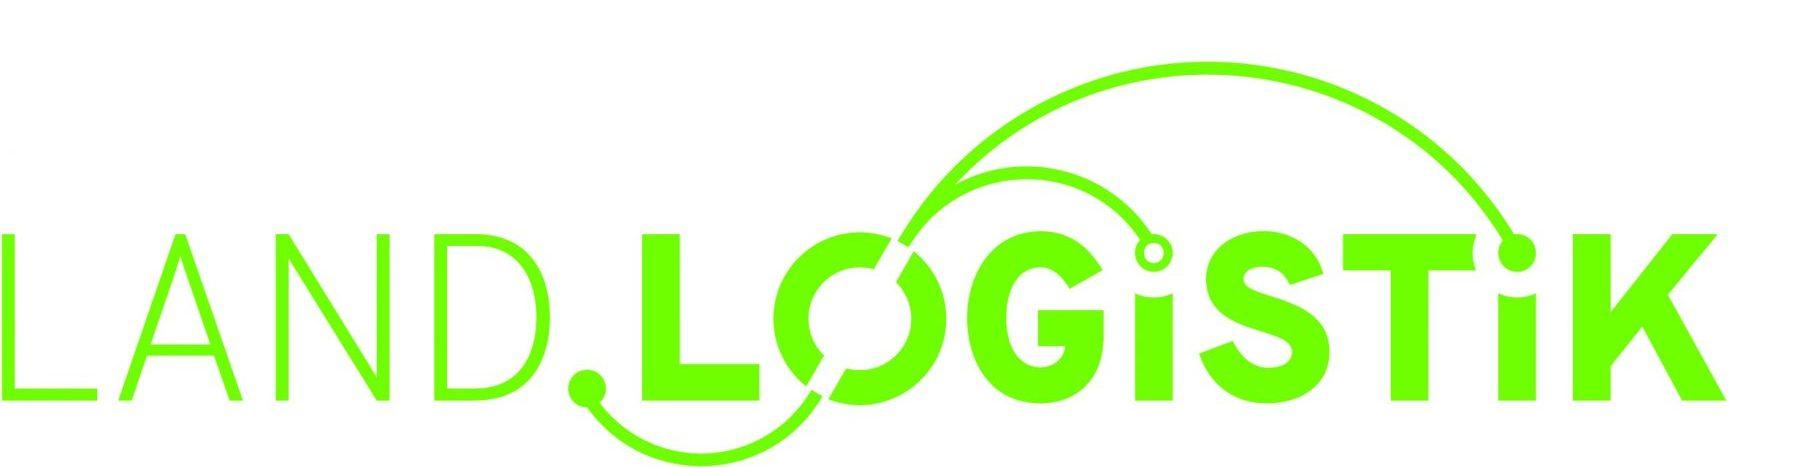 LaLoG LandLogistik GmbH